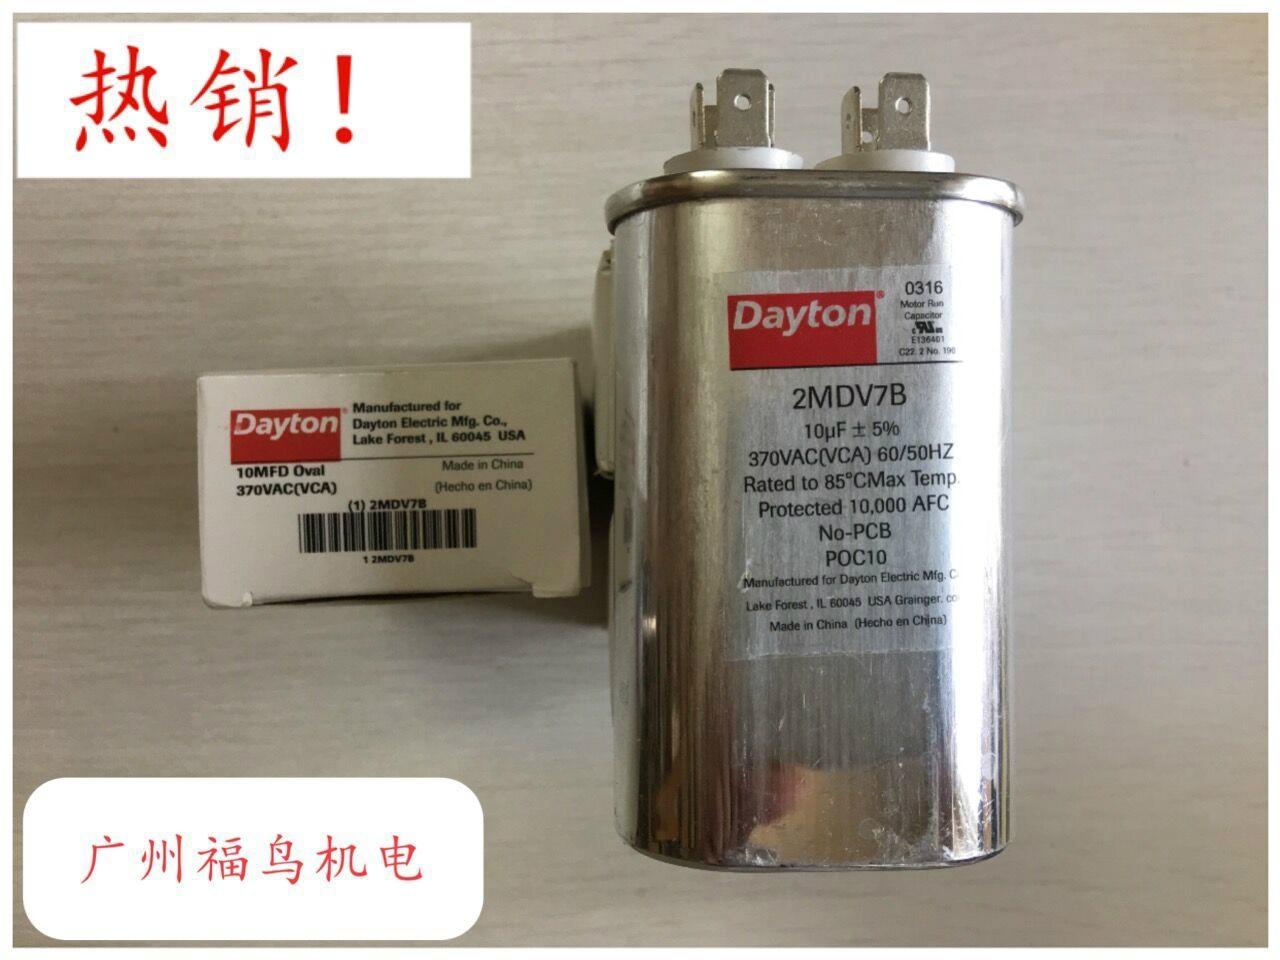 DAYTON电容, 型号: 2MDV7